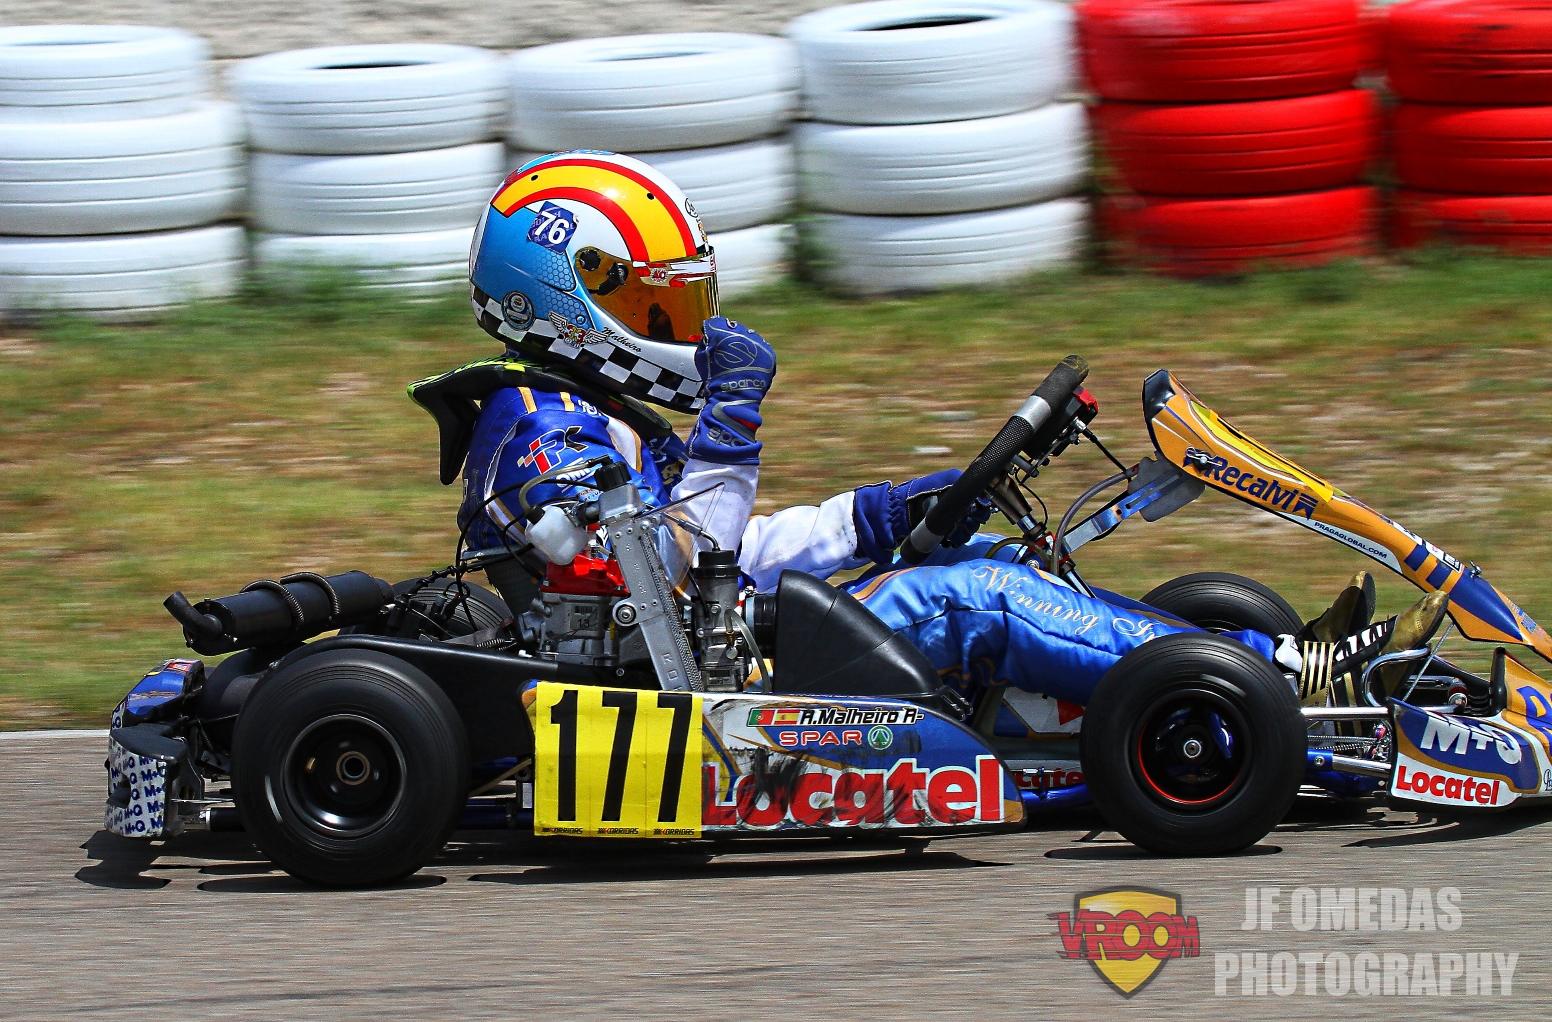 Copa Rotax Mini - Título con doblete para Adrián Malheiro